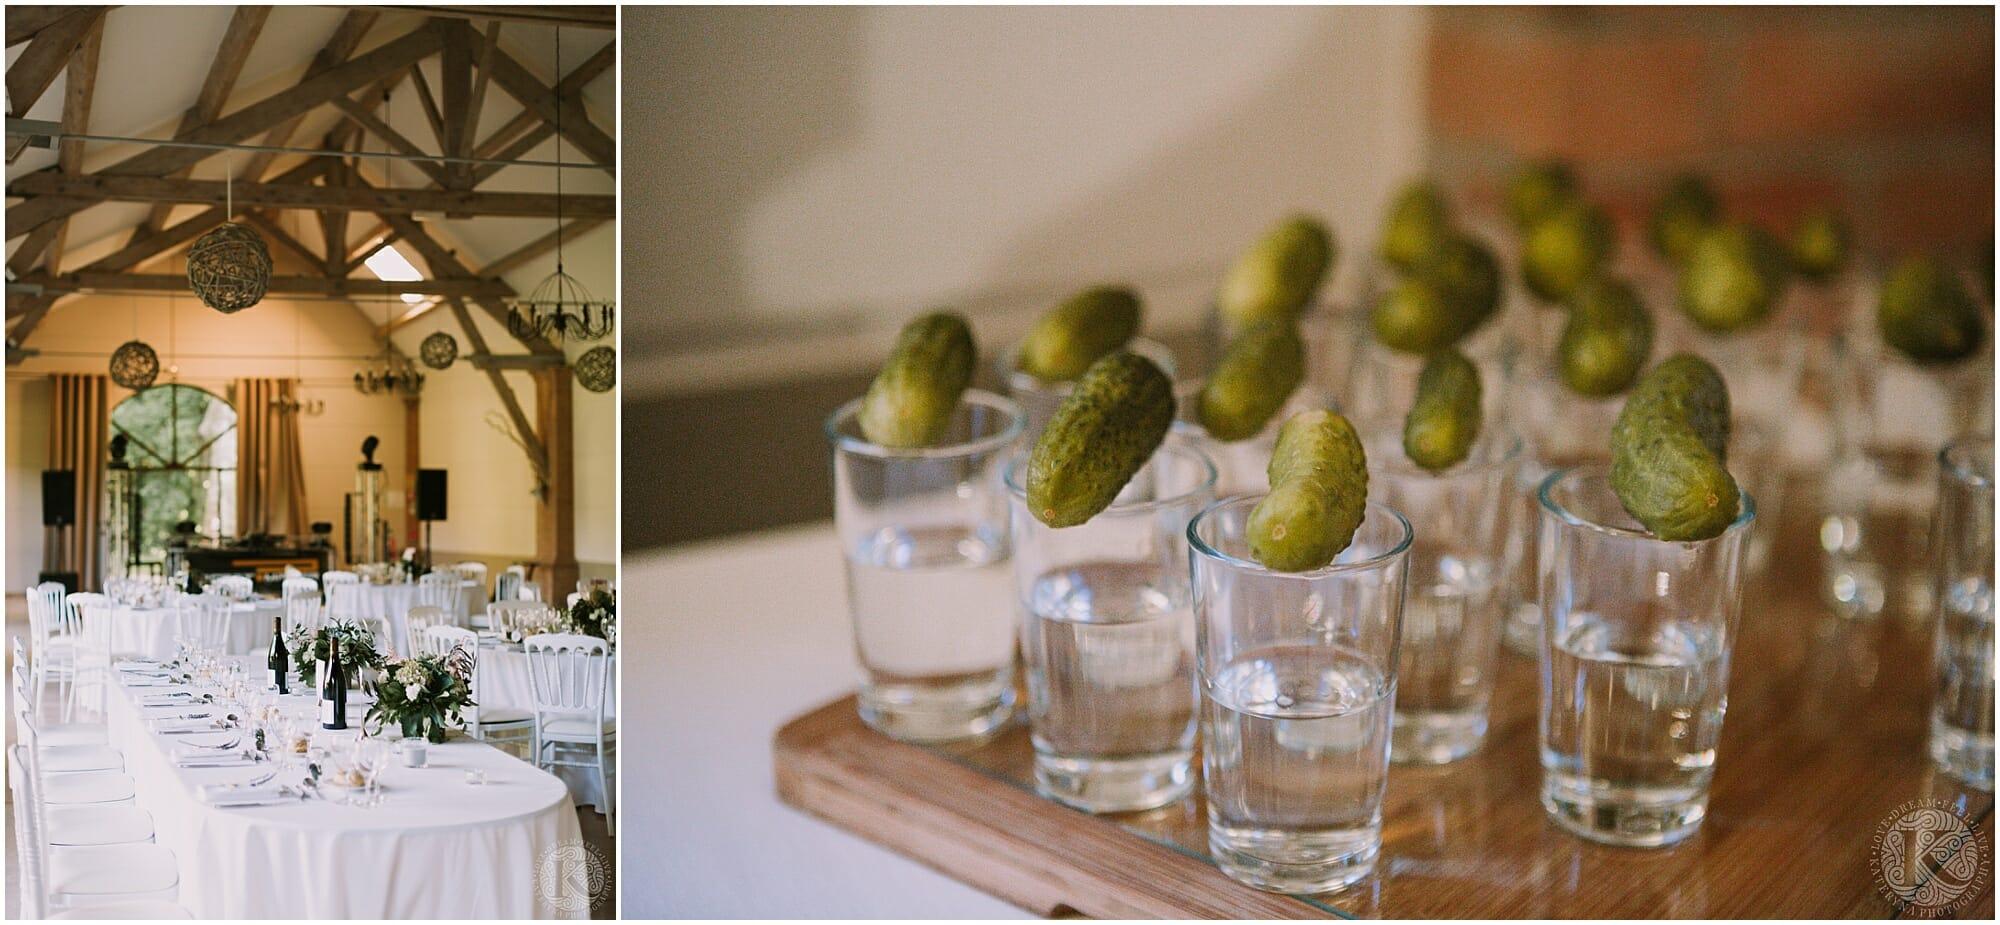 Kateryna-photos-photographe-mariage-chateau-des-3-fontaines-provence-avignon-vaucluse-sud_0113.jpg